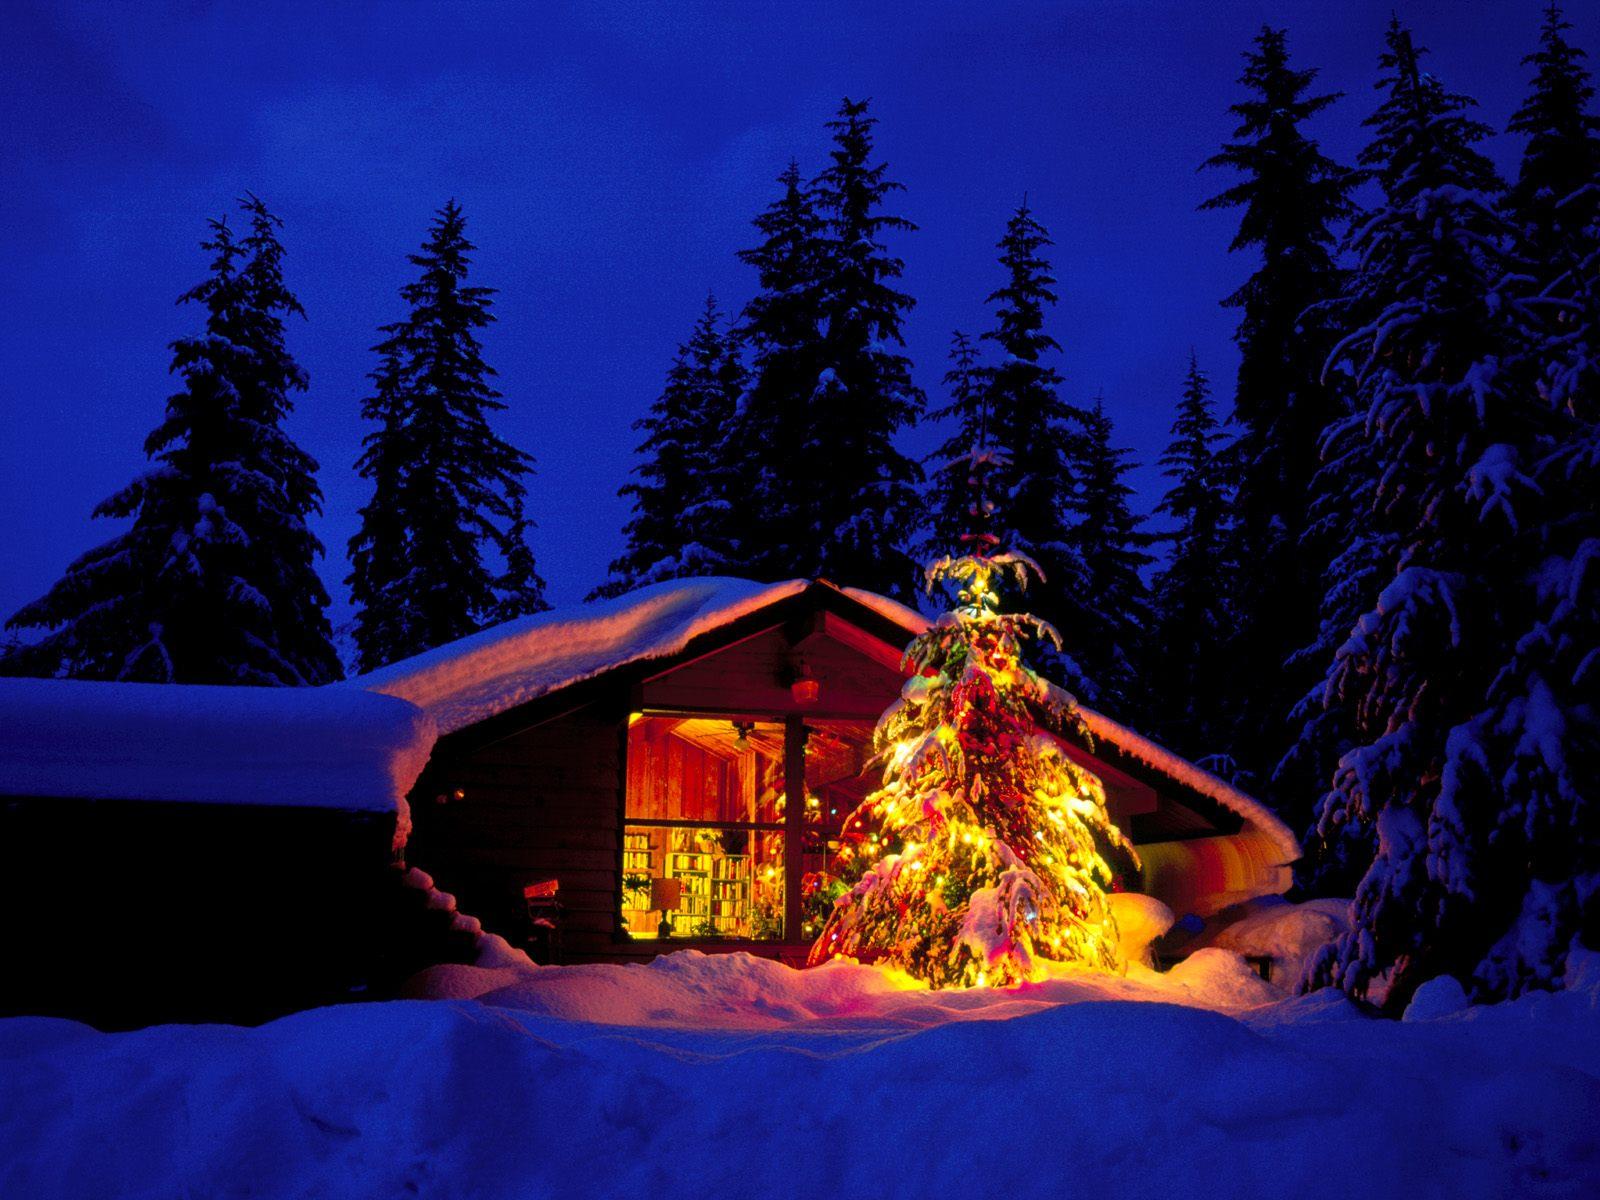 Christmas Wallpaper Hd 1280x1024 Download Wallpaper 1600x1200